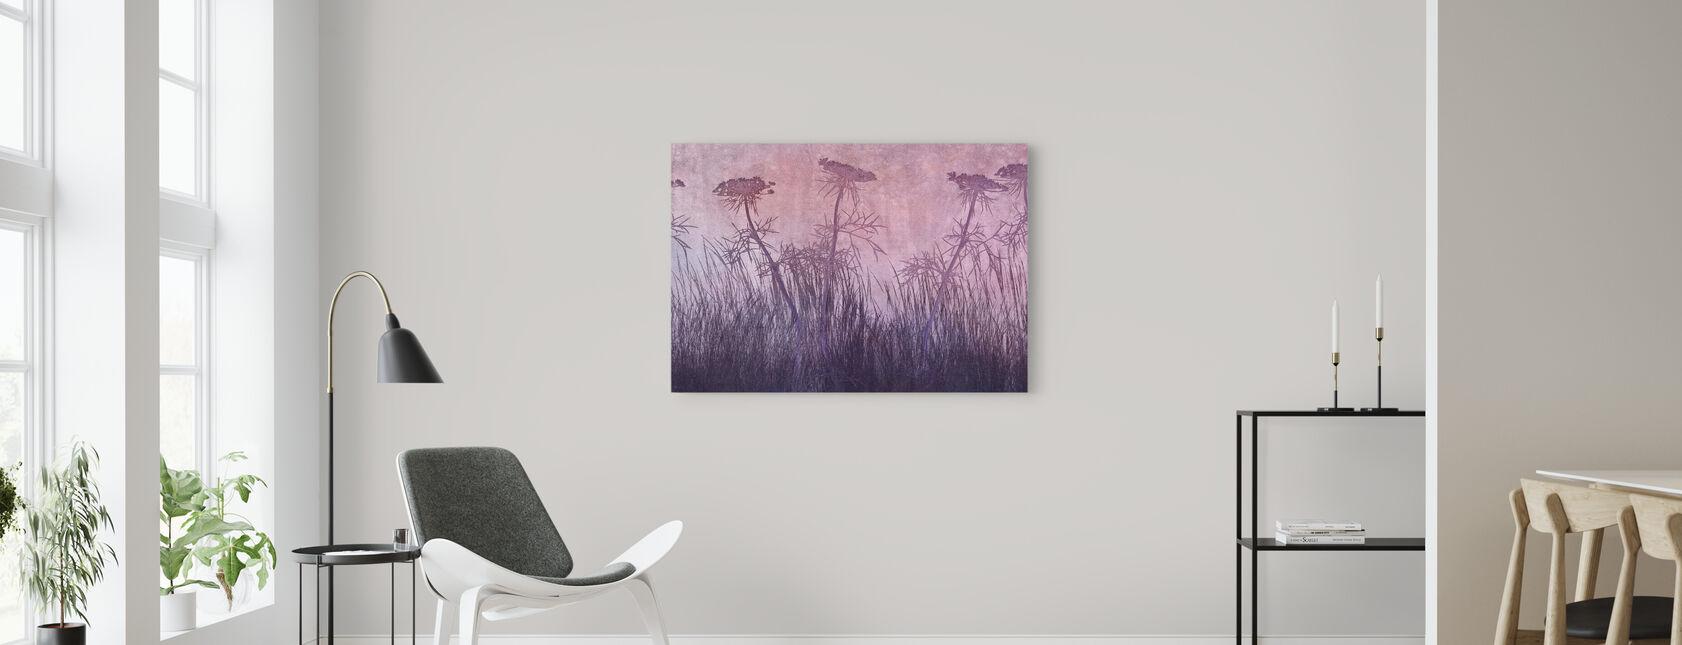 Purple Grass Silhouette - Canvas print - Living Room